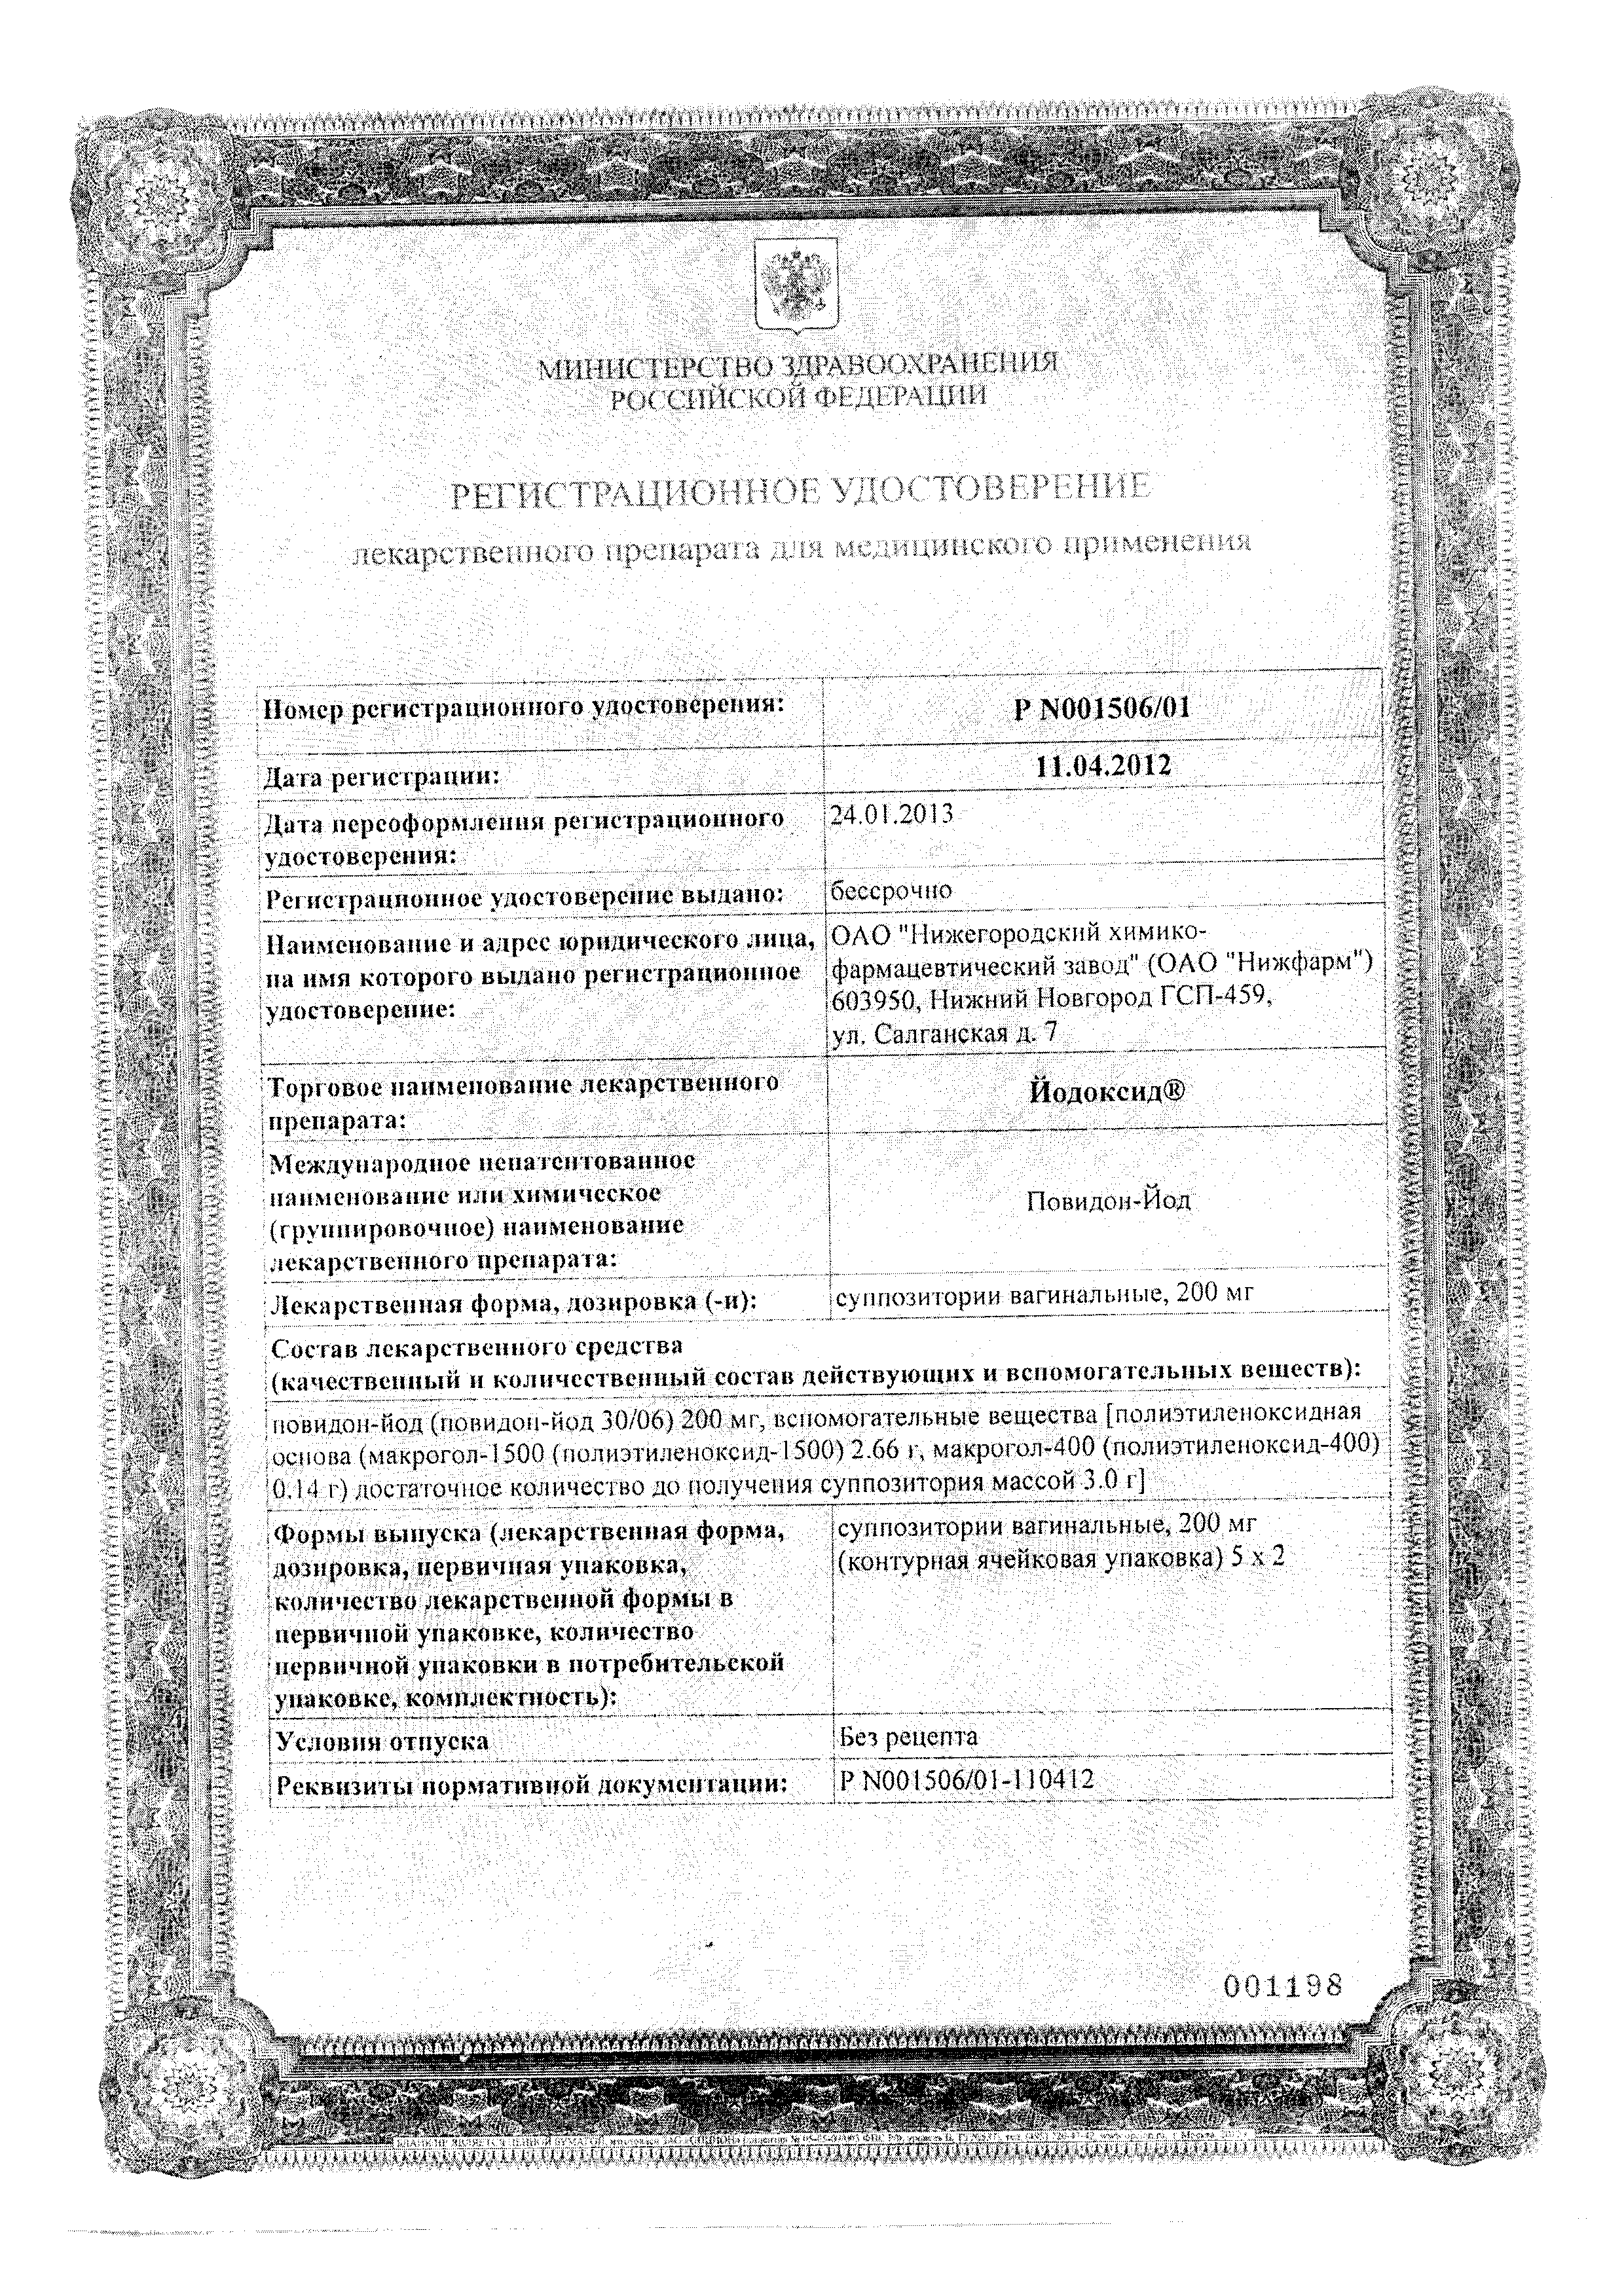 Йодоксид сертификат